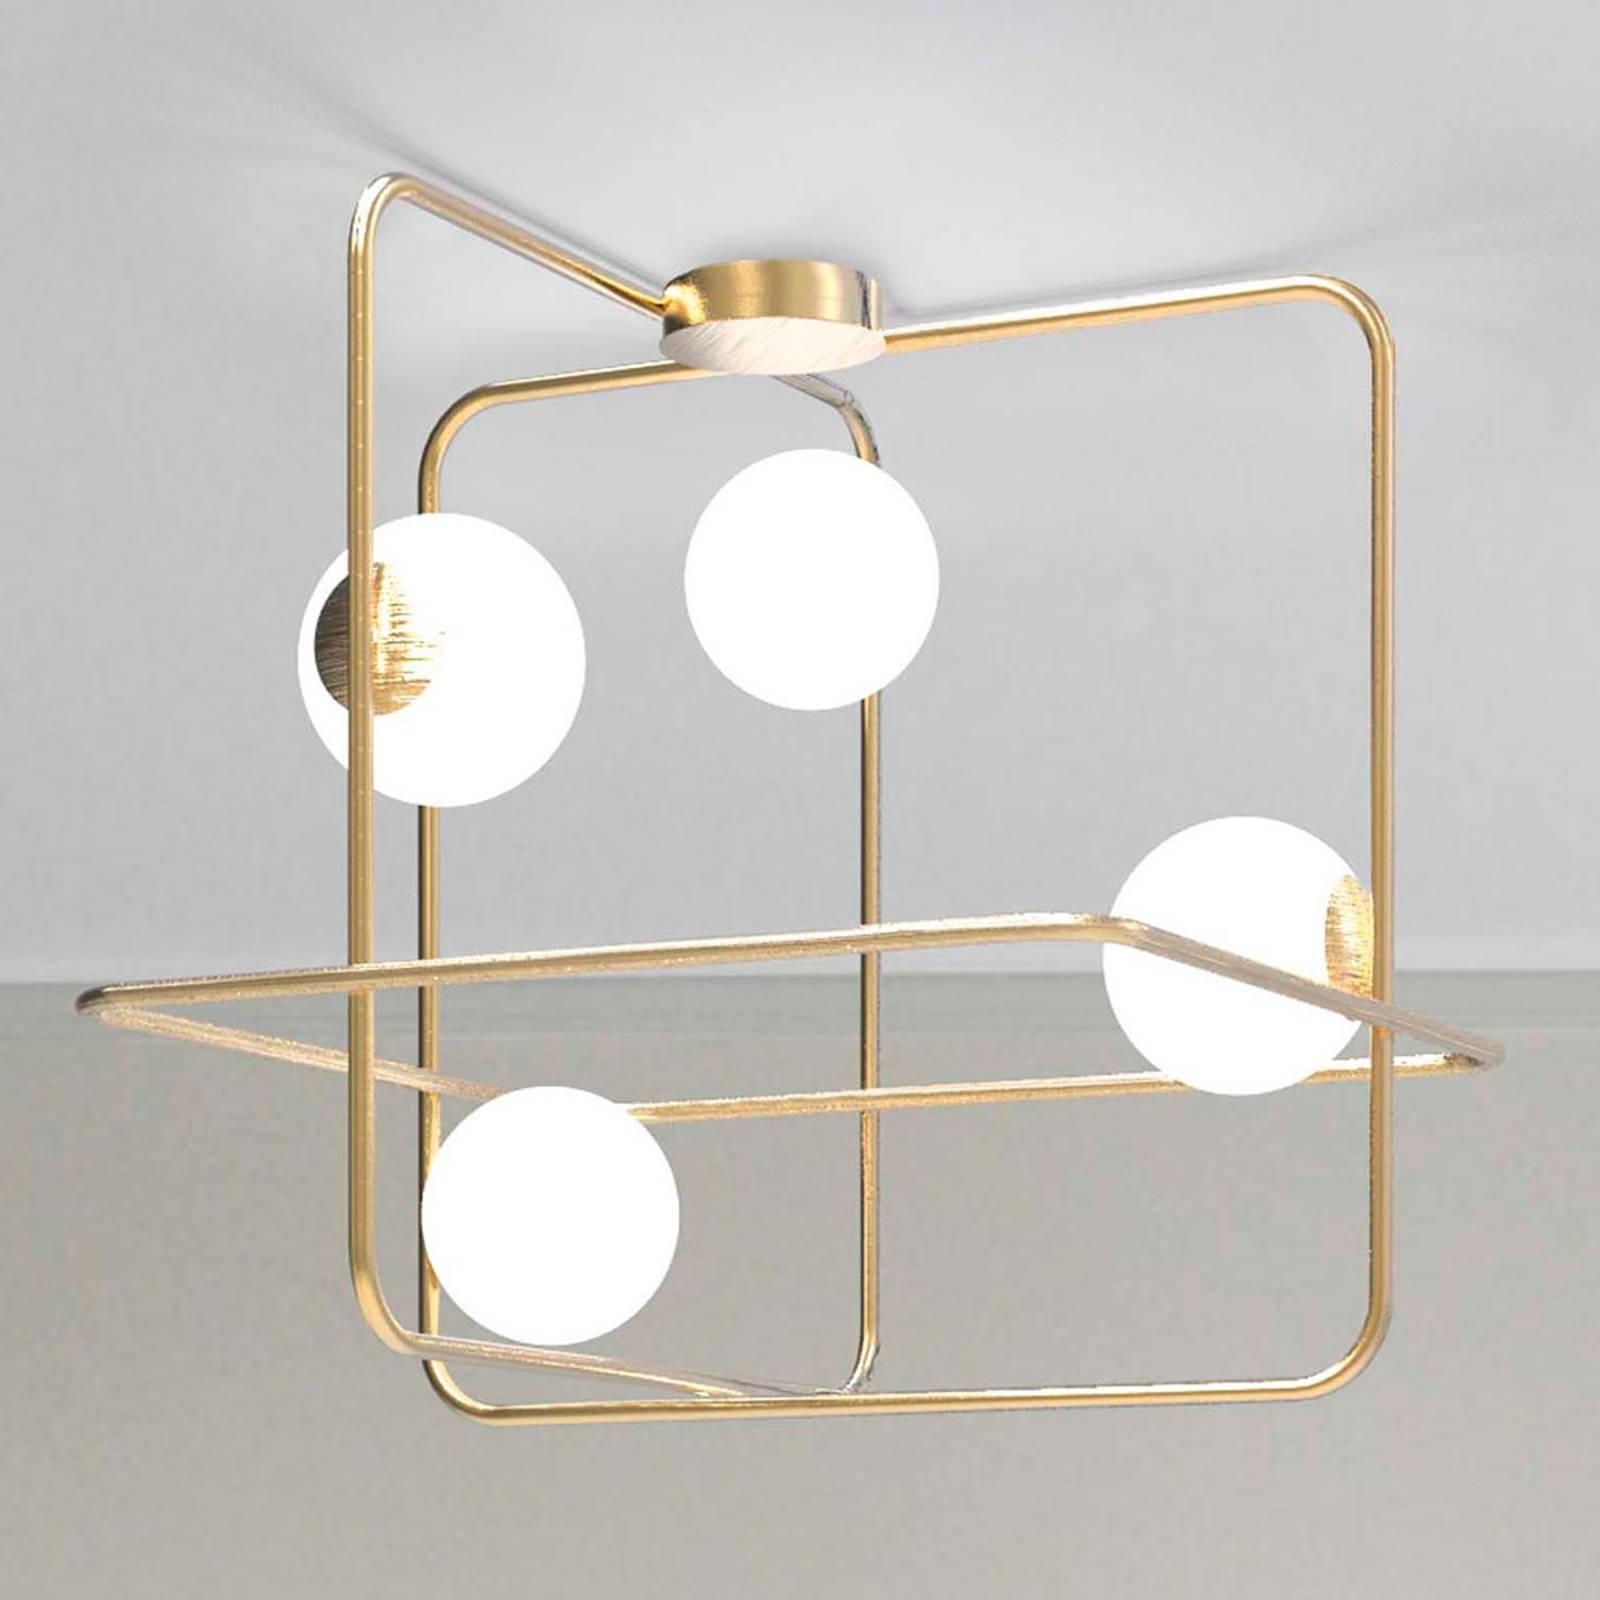 Plafondlamp Intrigo vierkant goud gesatineerd